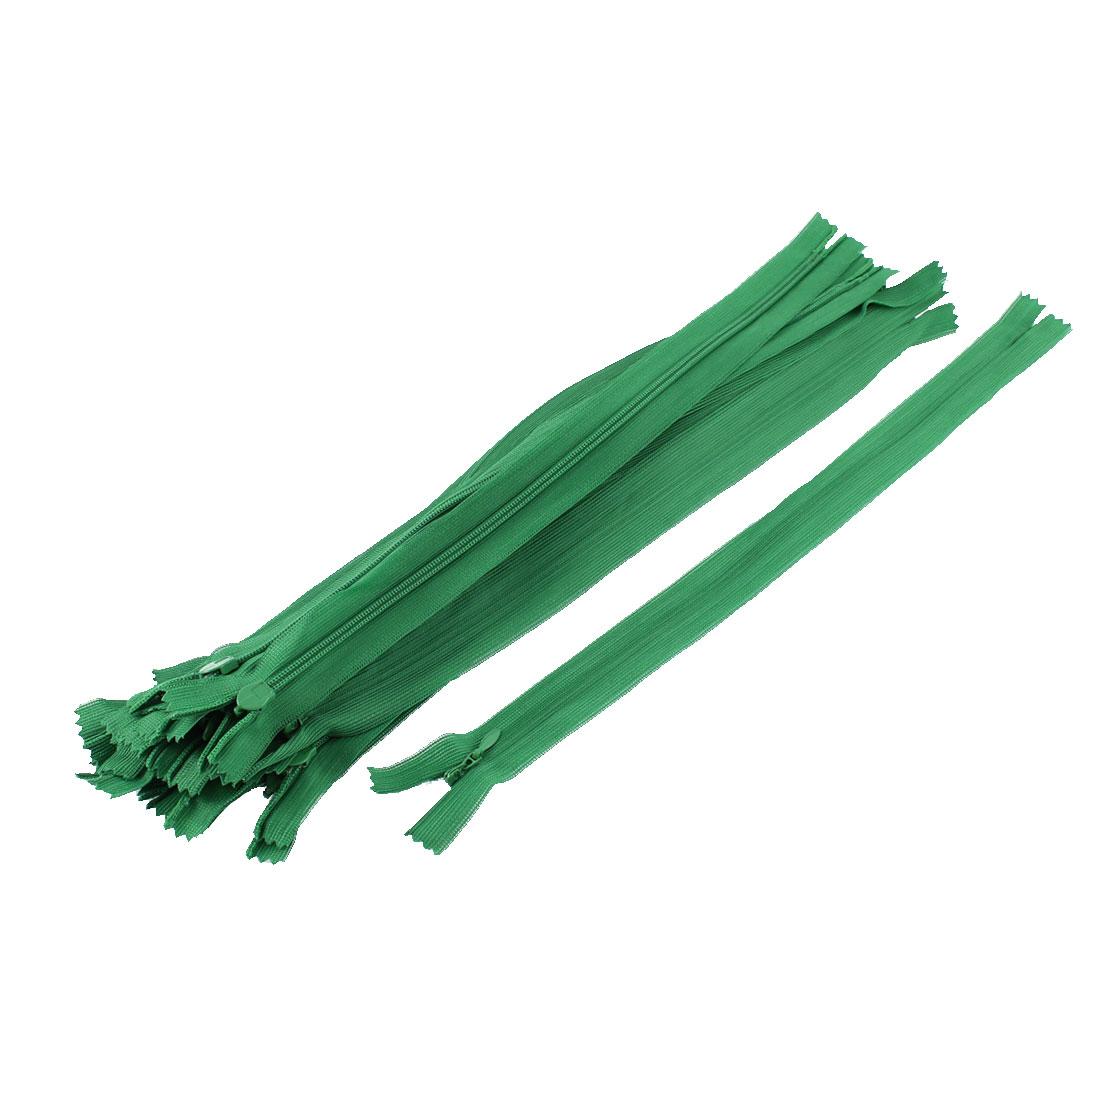 20 Pcs 12-inch Long Green Nylon Zippers Zips for Clothing